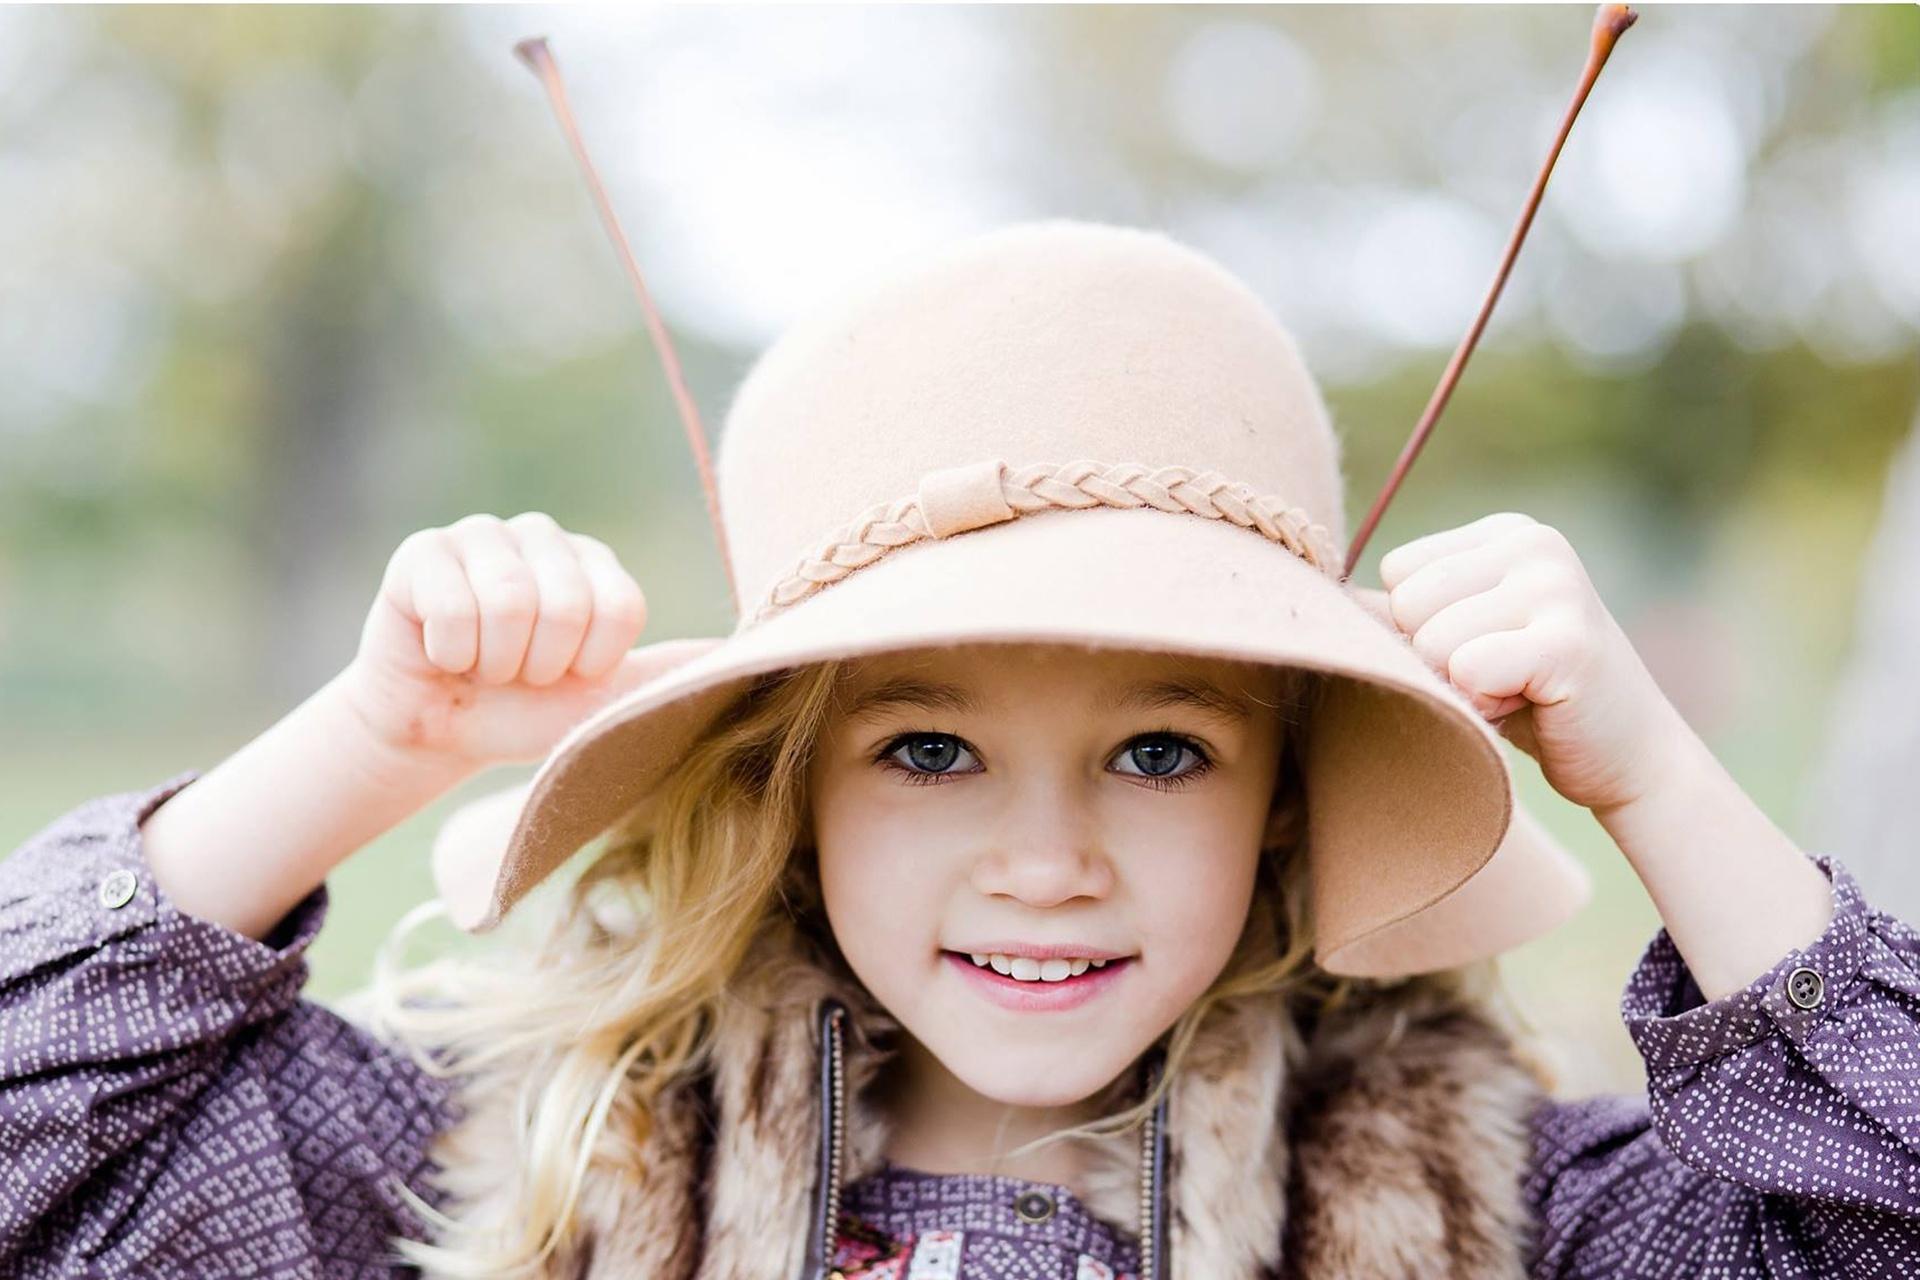 Girl playing with sticks photos